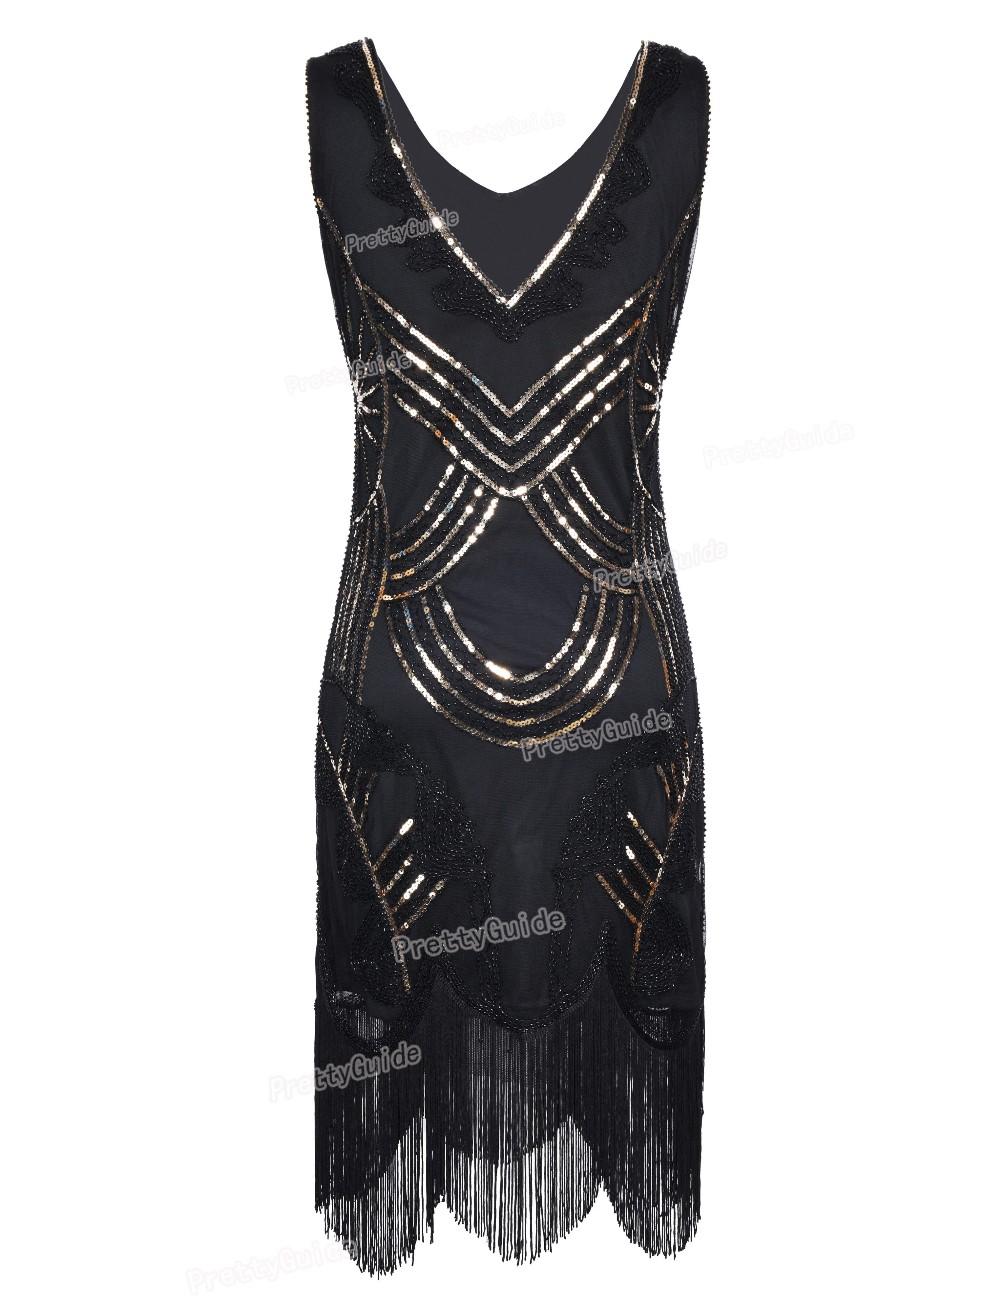 0c89ffdb373 PrettyGuide Women s 1920s Vintage Gatsby Art Deco Beads Fringed ...